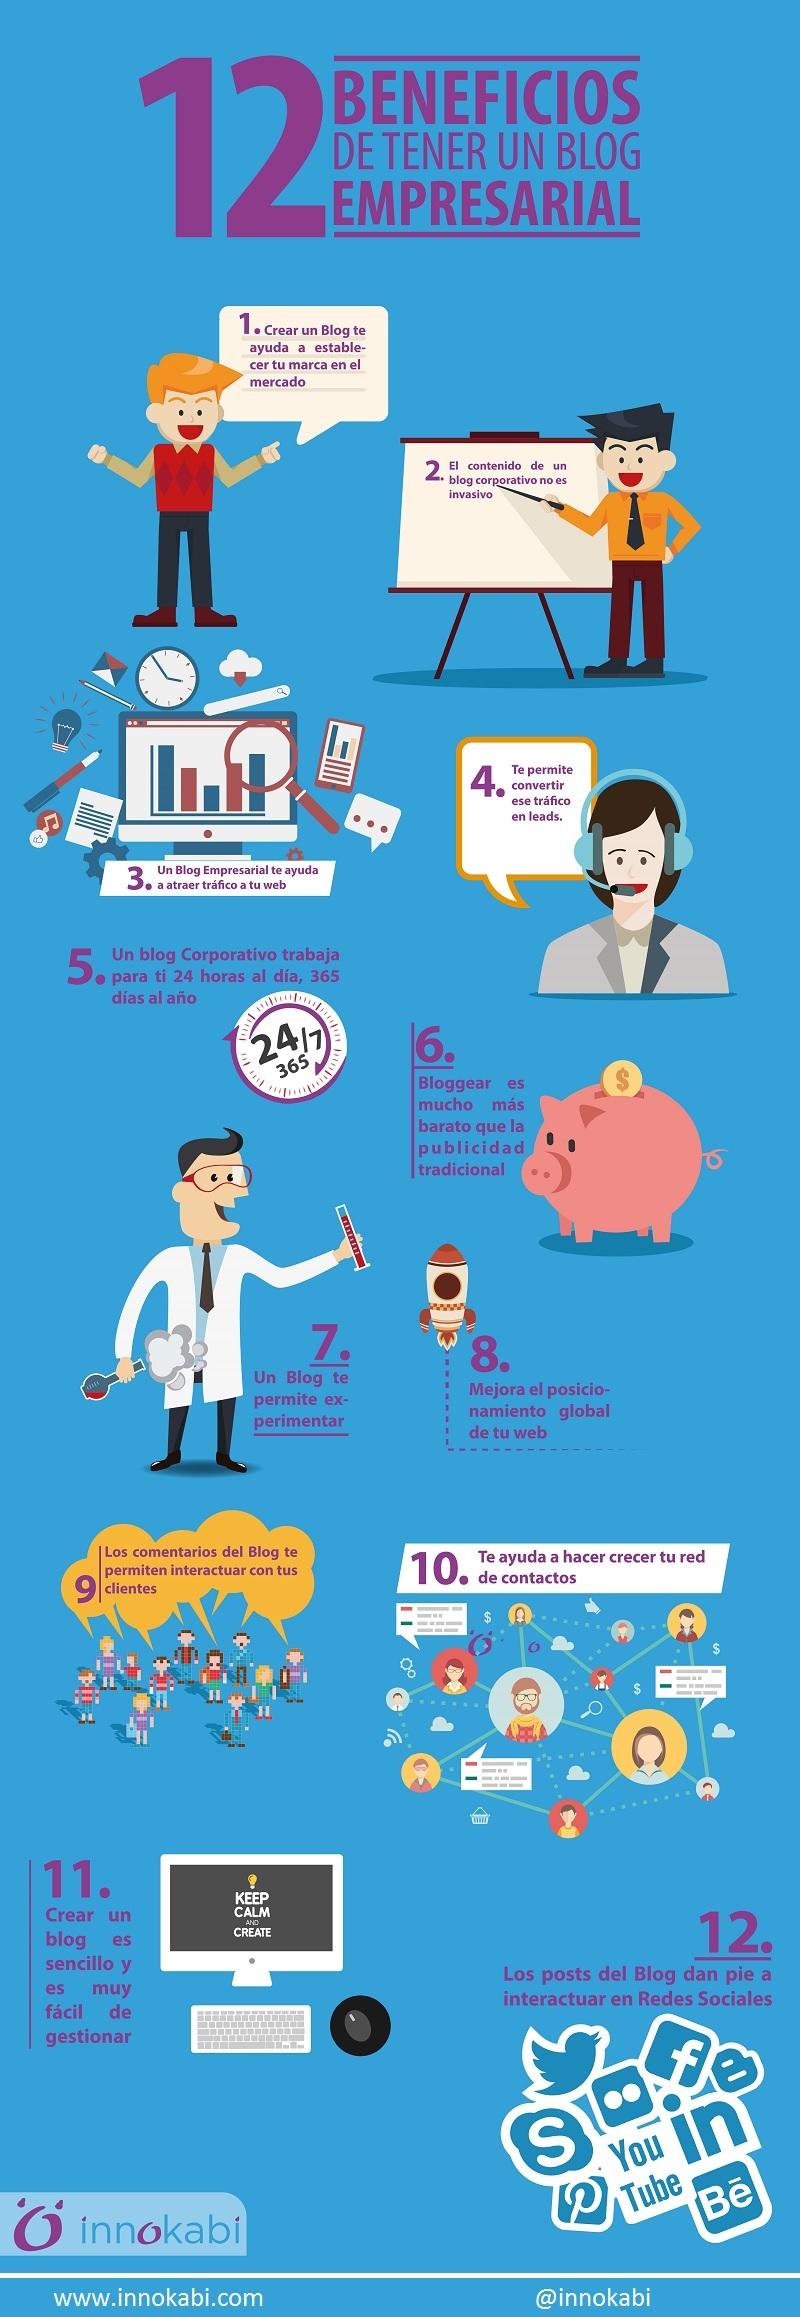 12 beneficios de tener un Blog de empresa